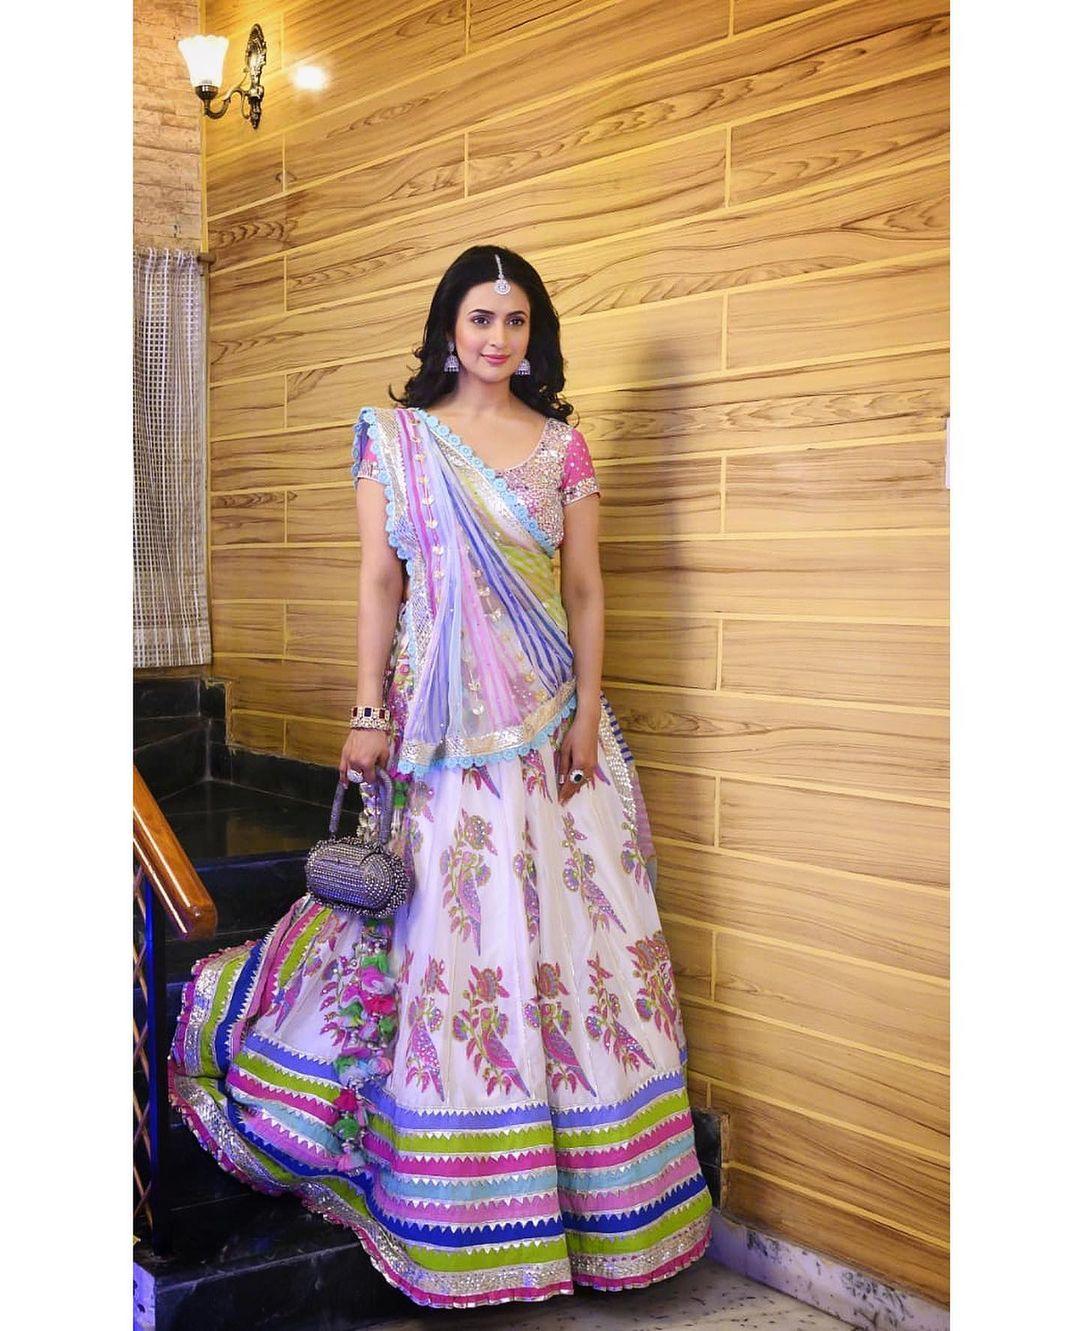 Bridesmaids Outfit Idea